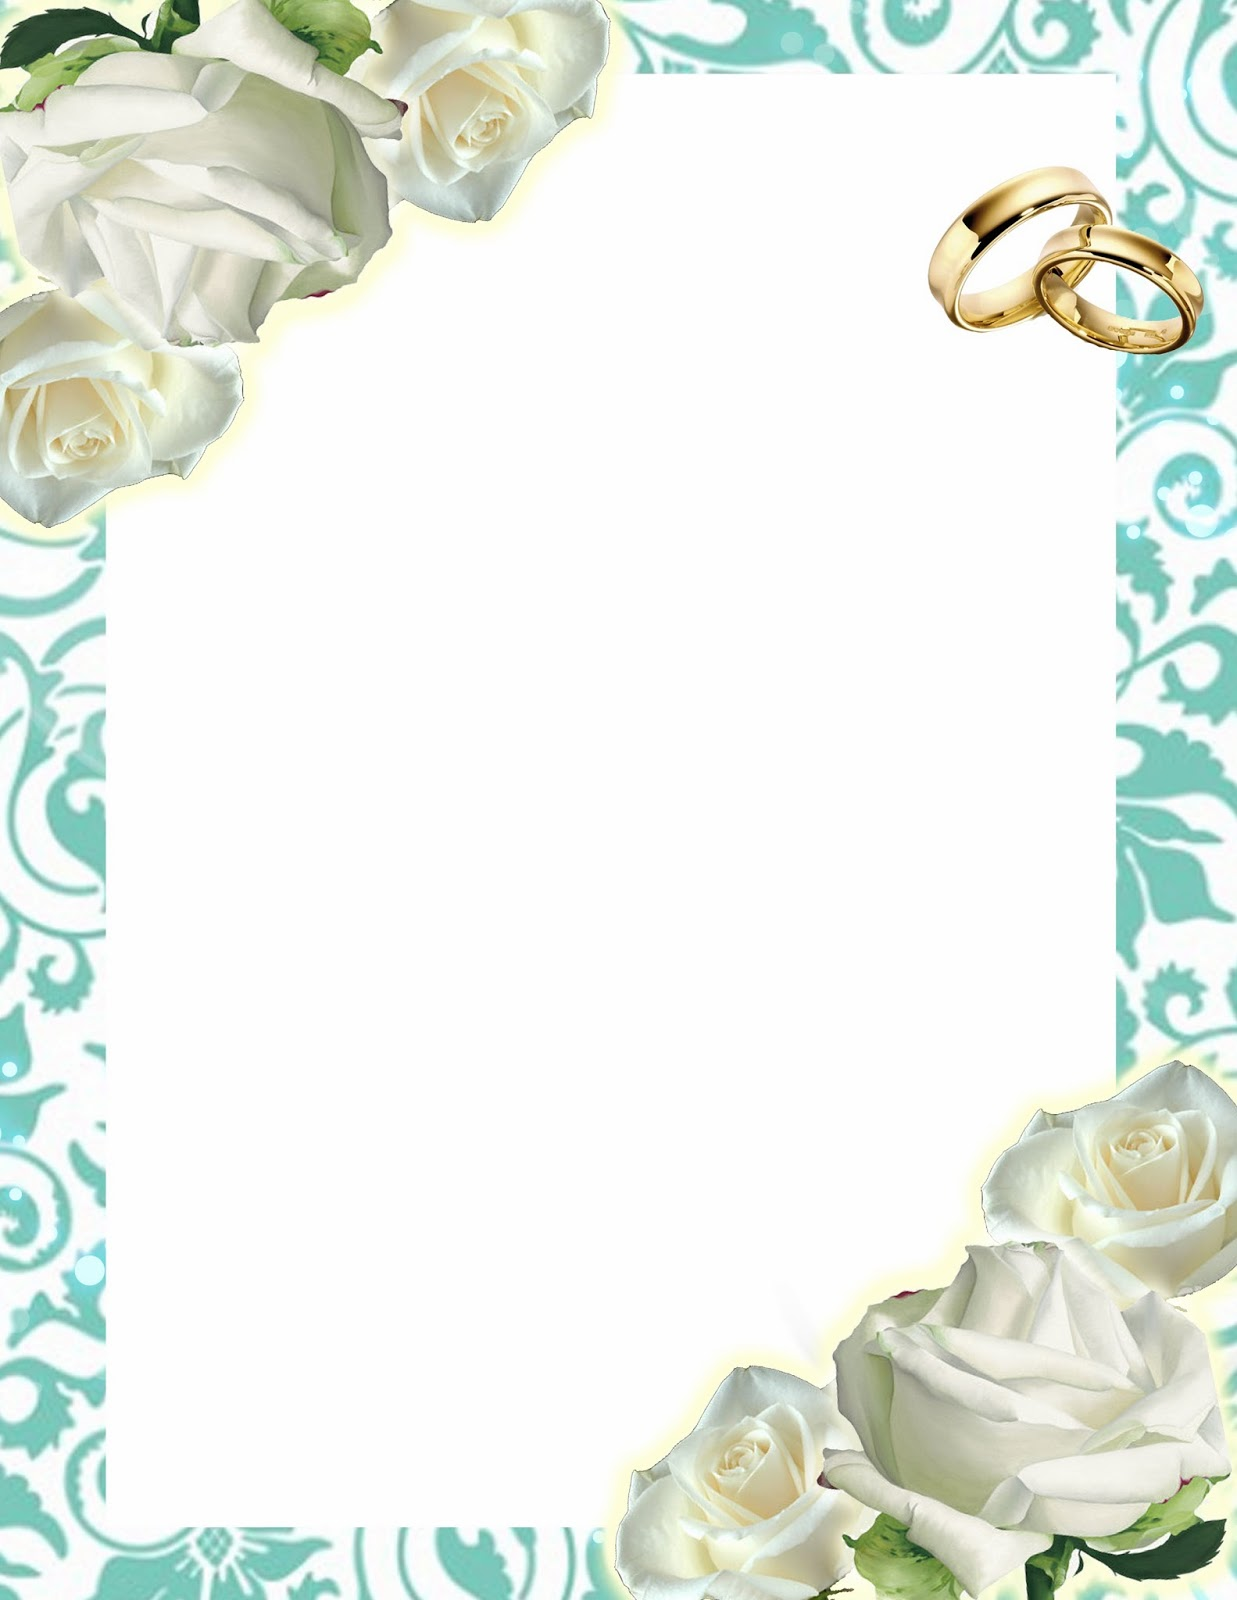 33 tatuajes de anillos de matrimonio imposiblemente dulces